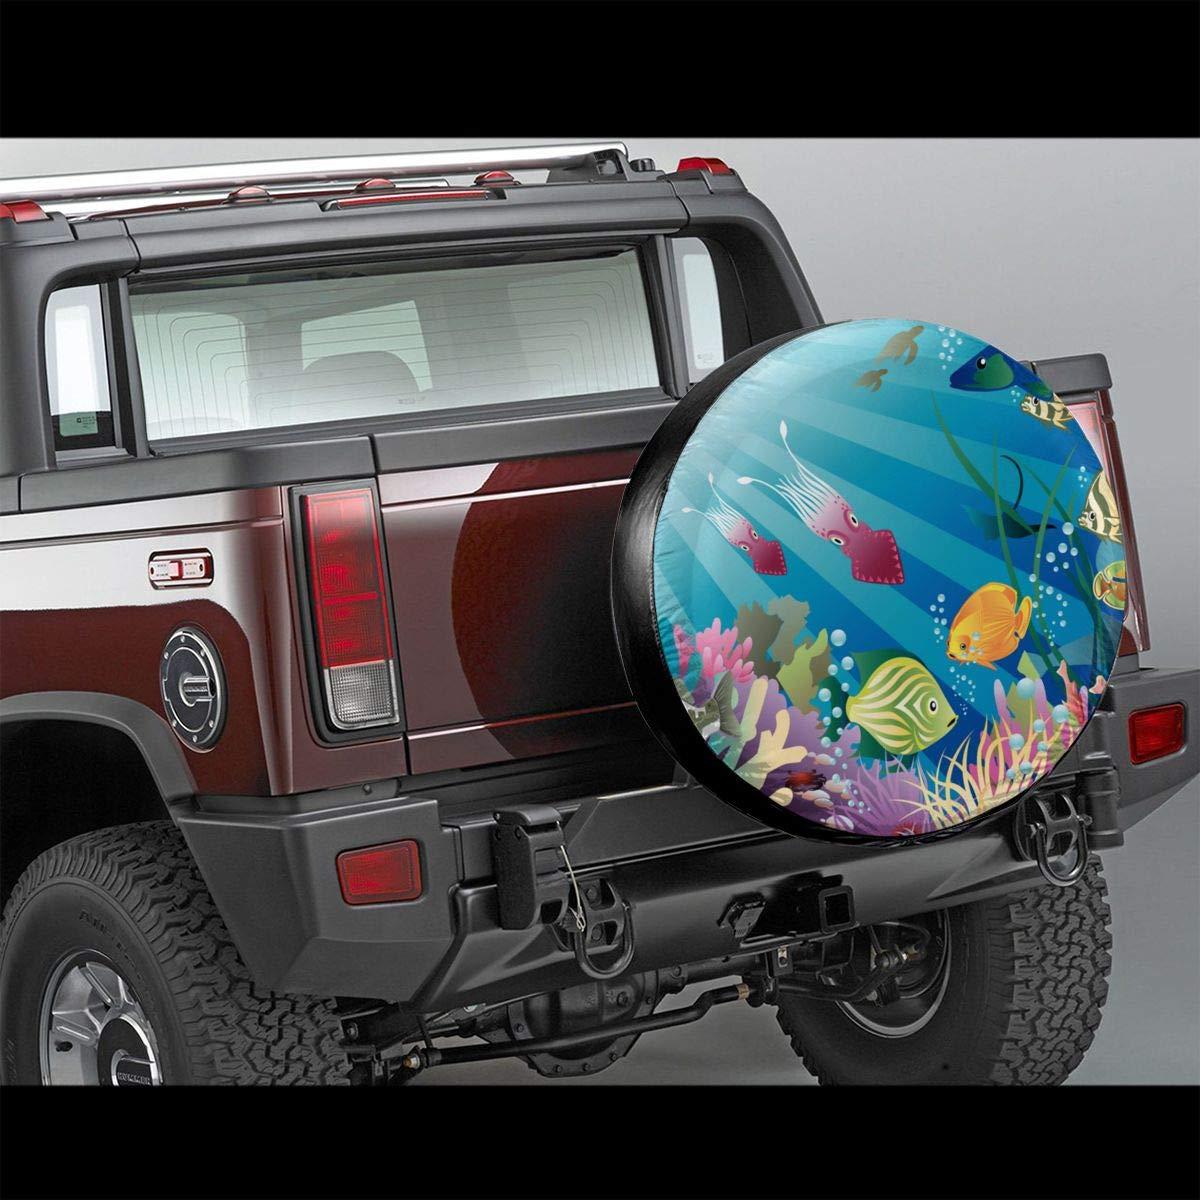 Pokuisnb Sunscreen Fish Tank Aquarium Alphabet Spare Tire Covers for All Cars 17 Inch by Pokuisnb (Image #2)